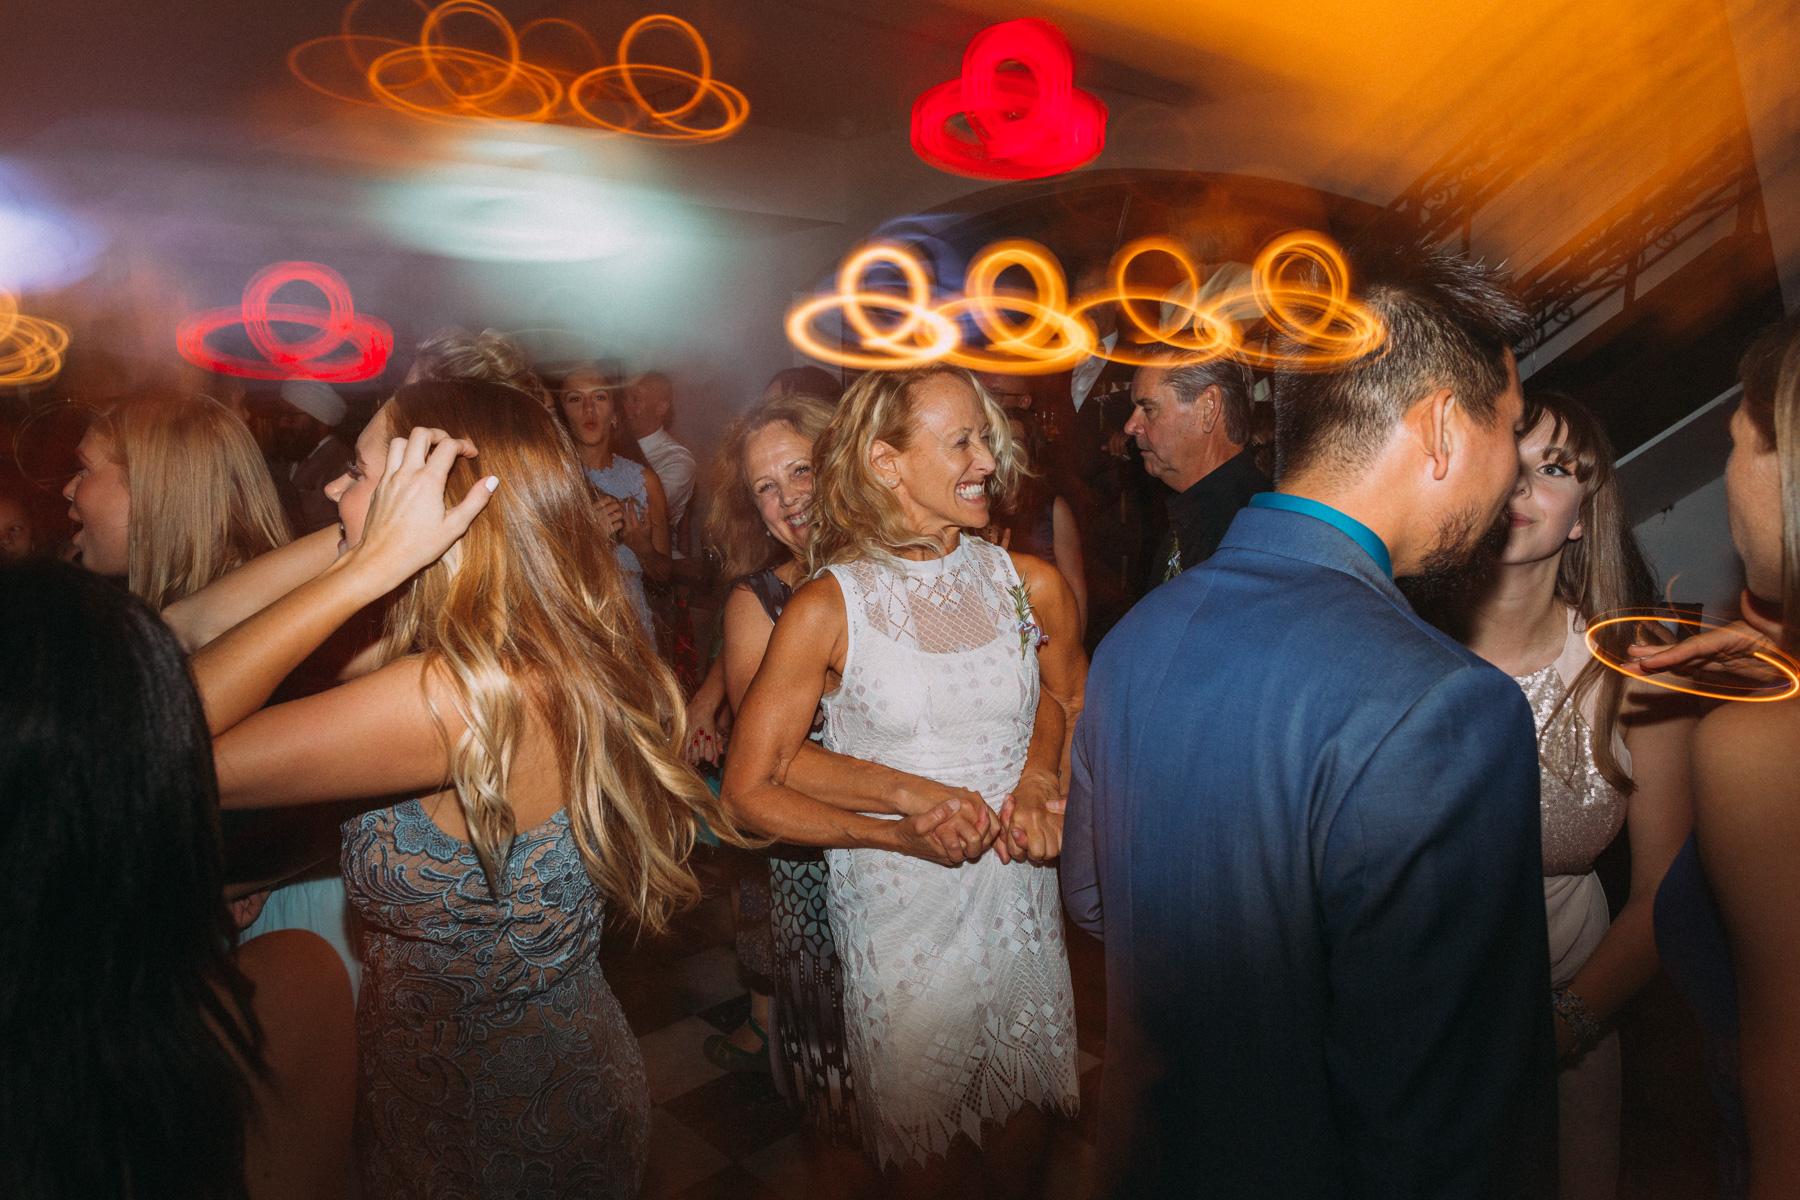 La-Maquette-wedding-by-Toronto-modern-wedding-photographer-Sam-Wong_52.jpg